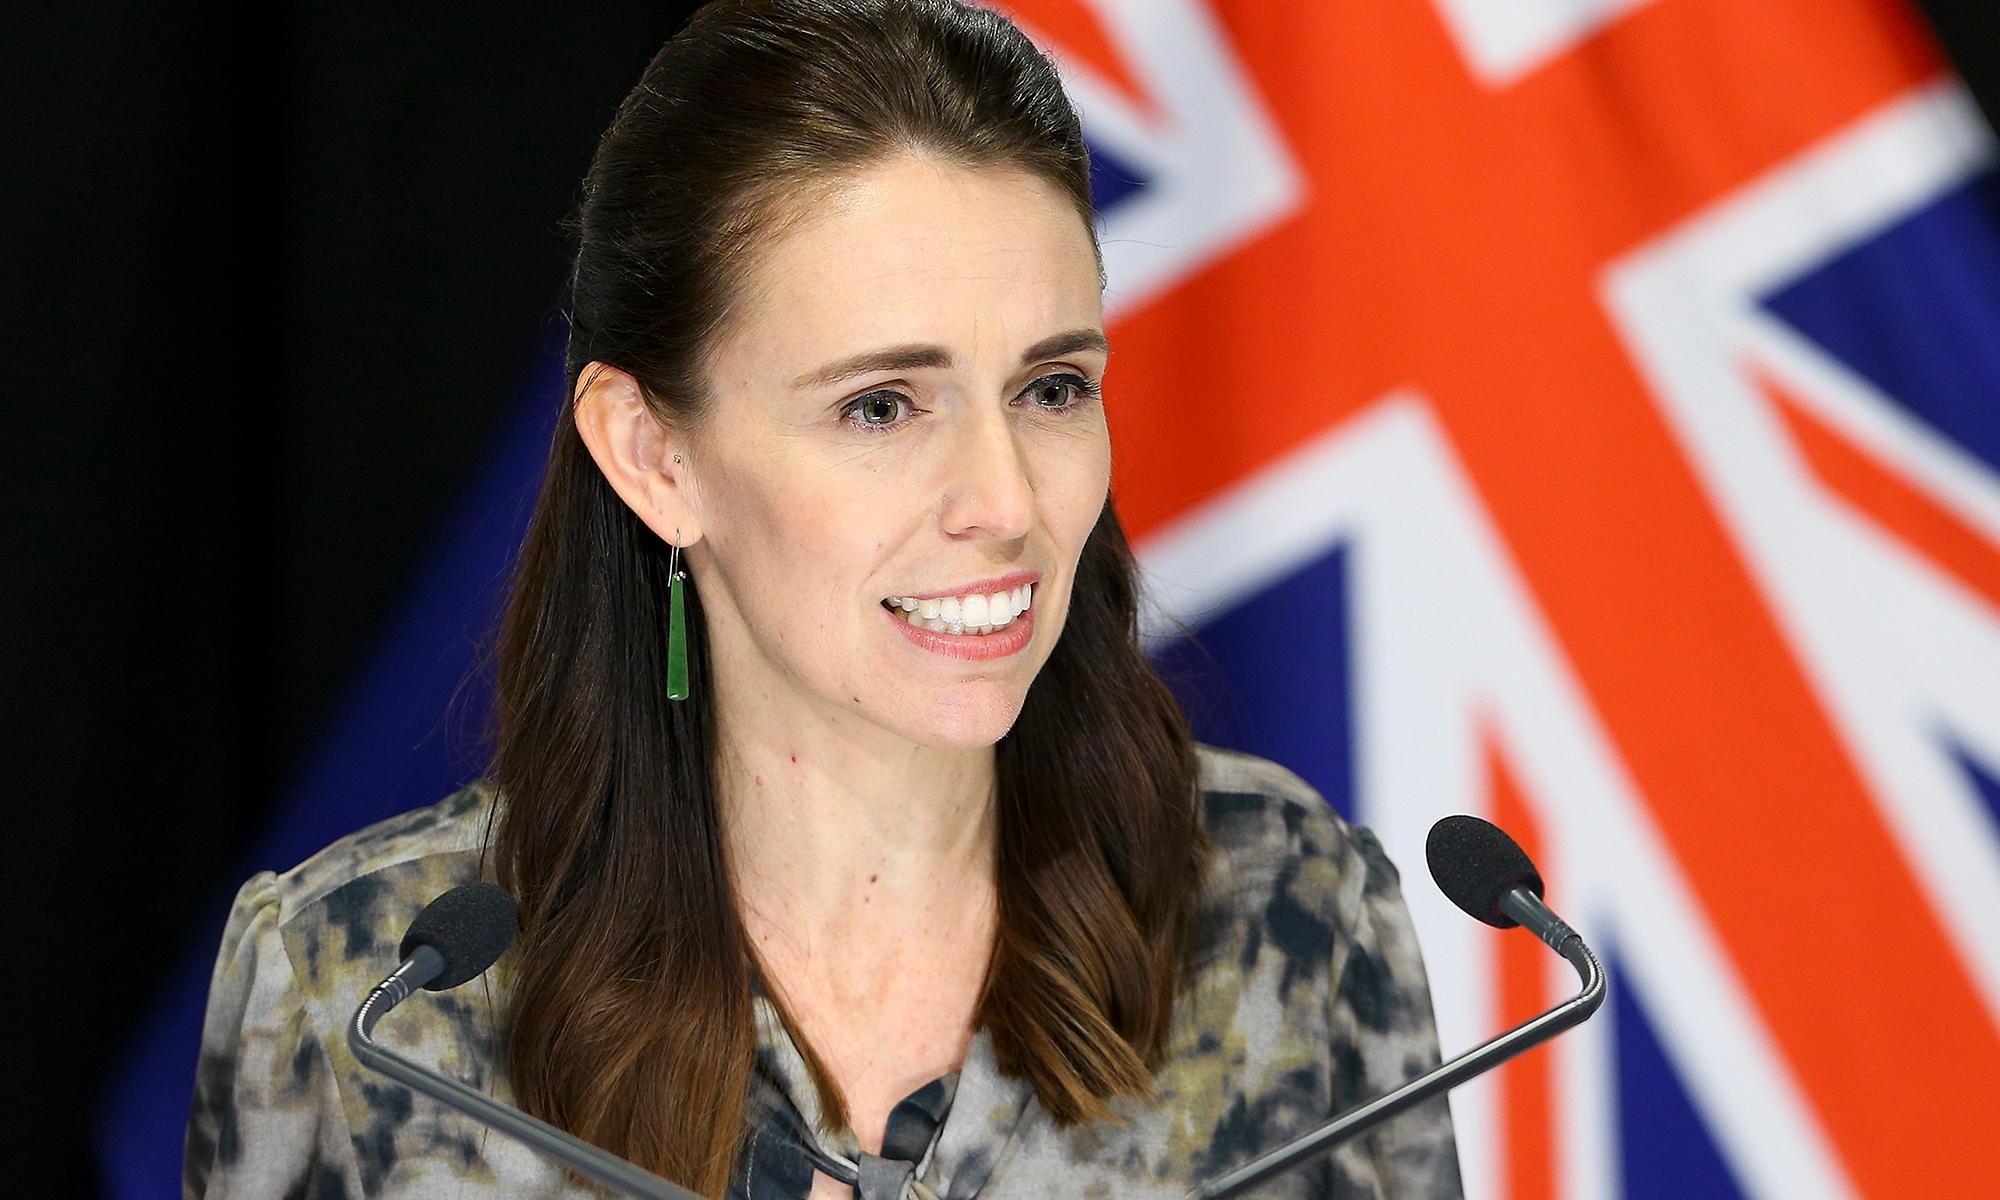 New Zealand jacinda ardern